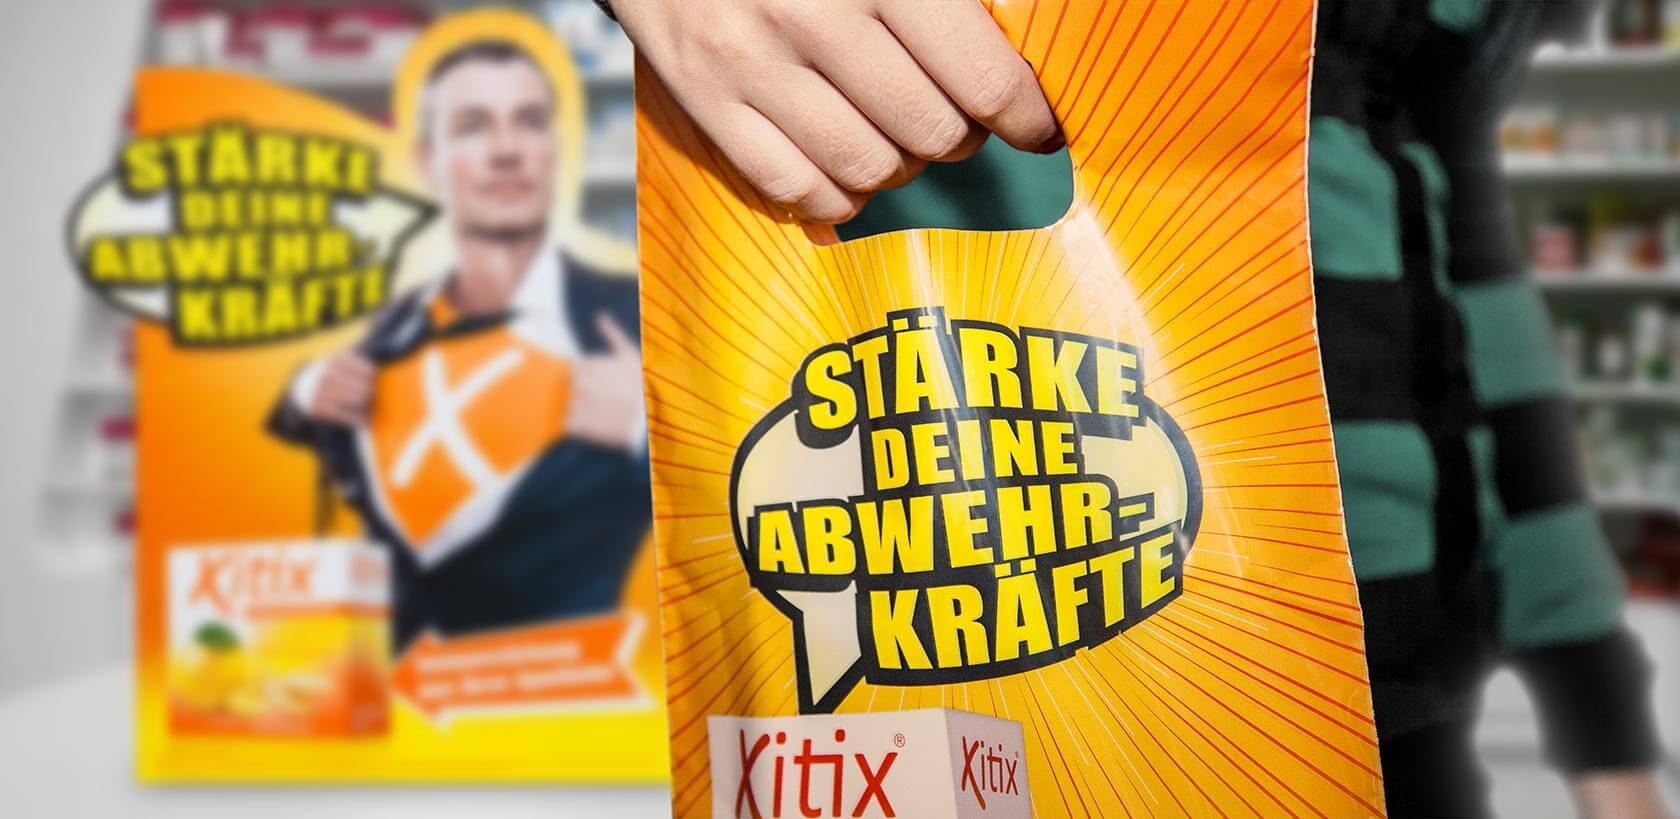 Xitix Tragetasche, Gestaltung